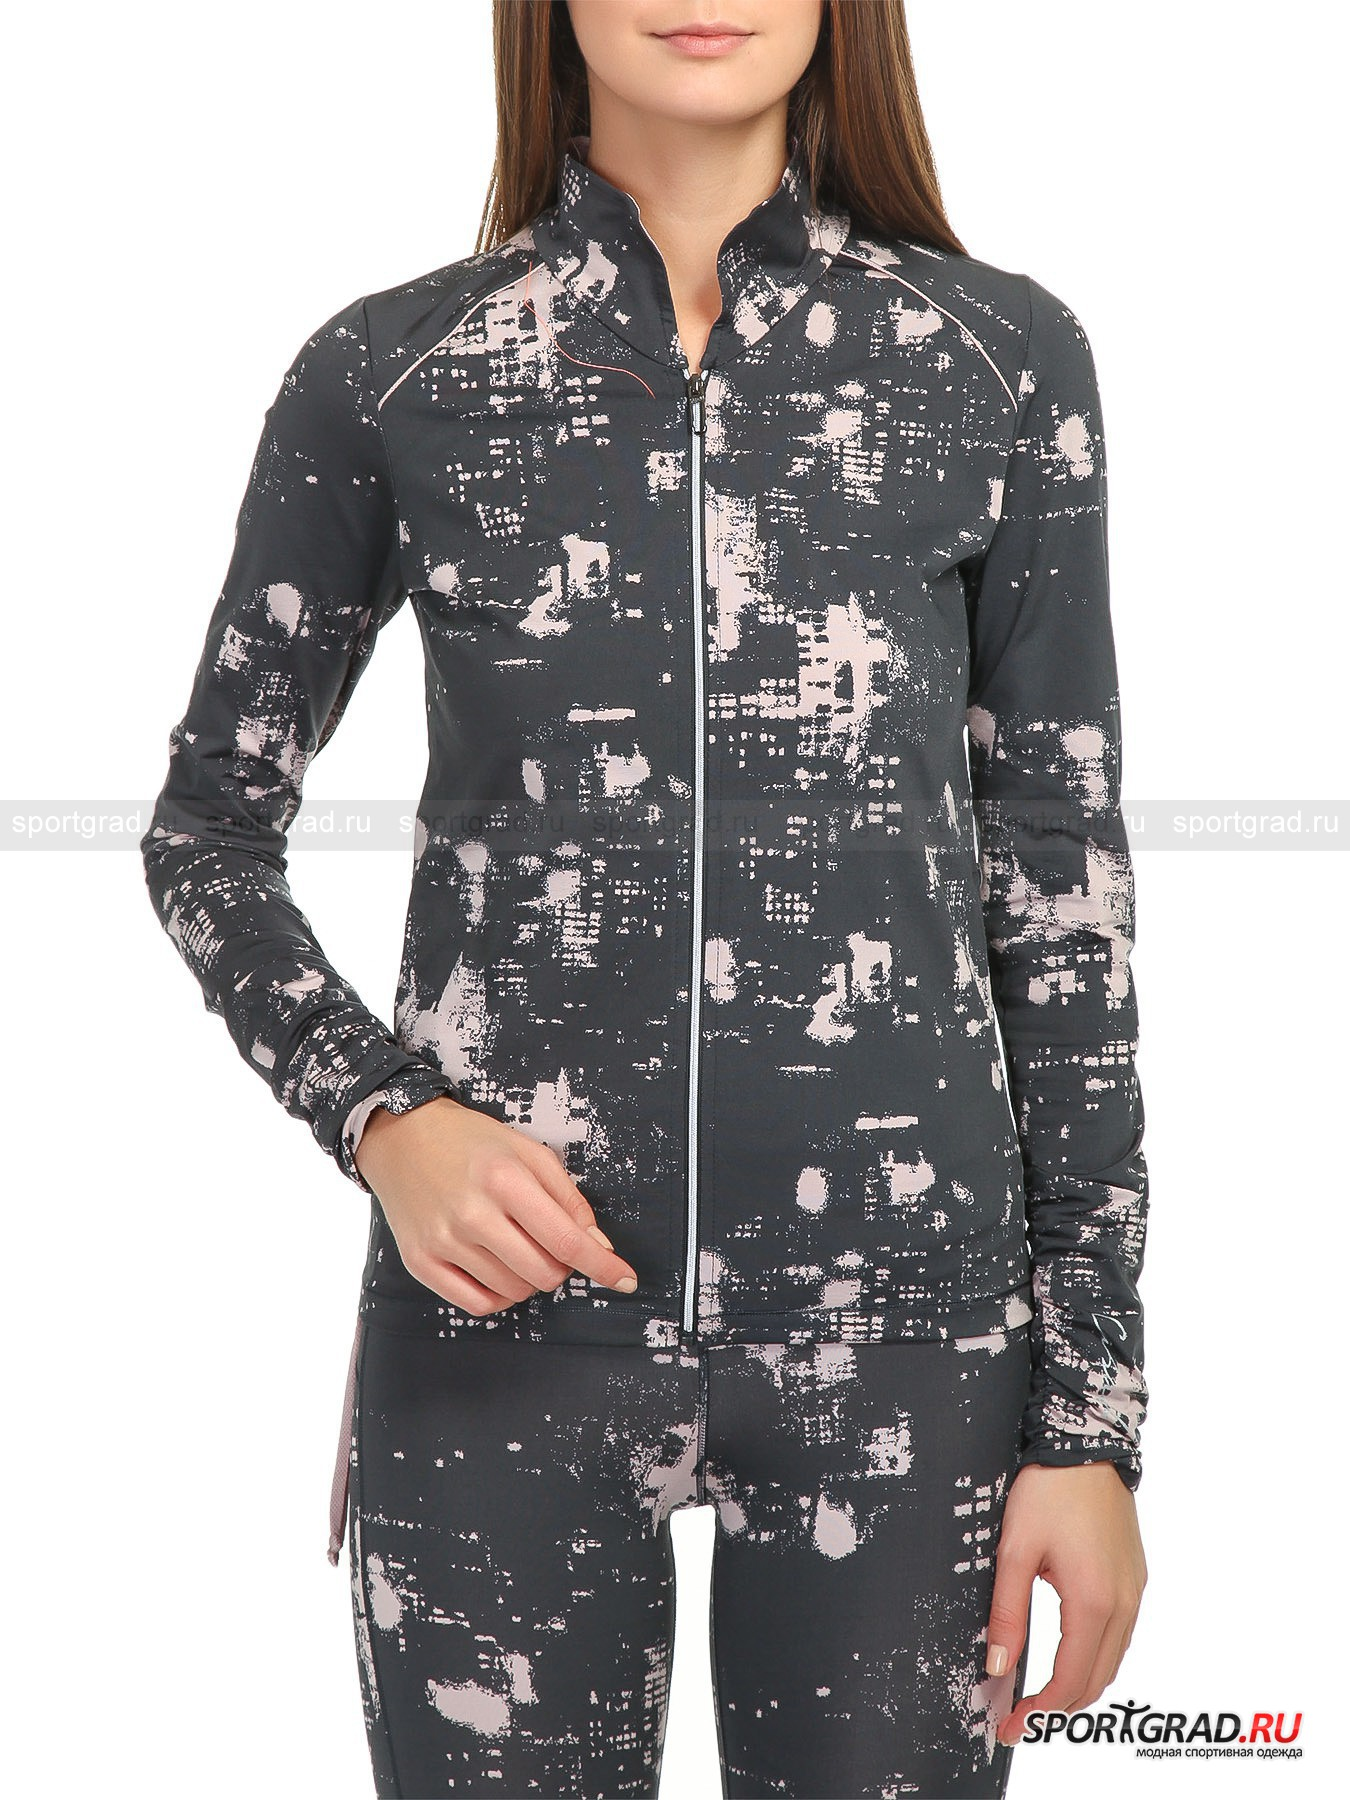 ��������� ������� ������������ Midtown Jacket CASALL ��� ������� �������